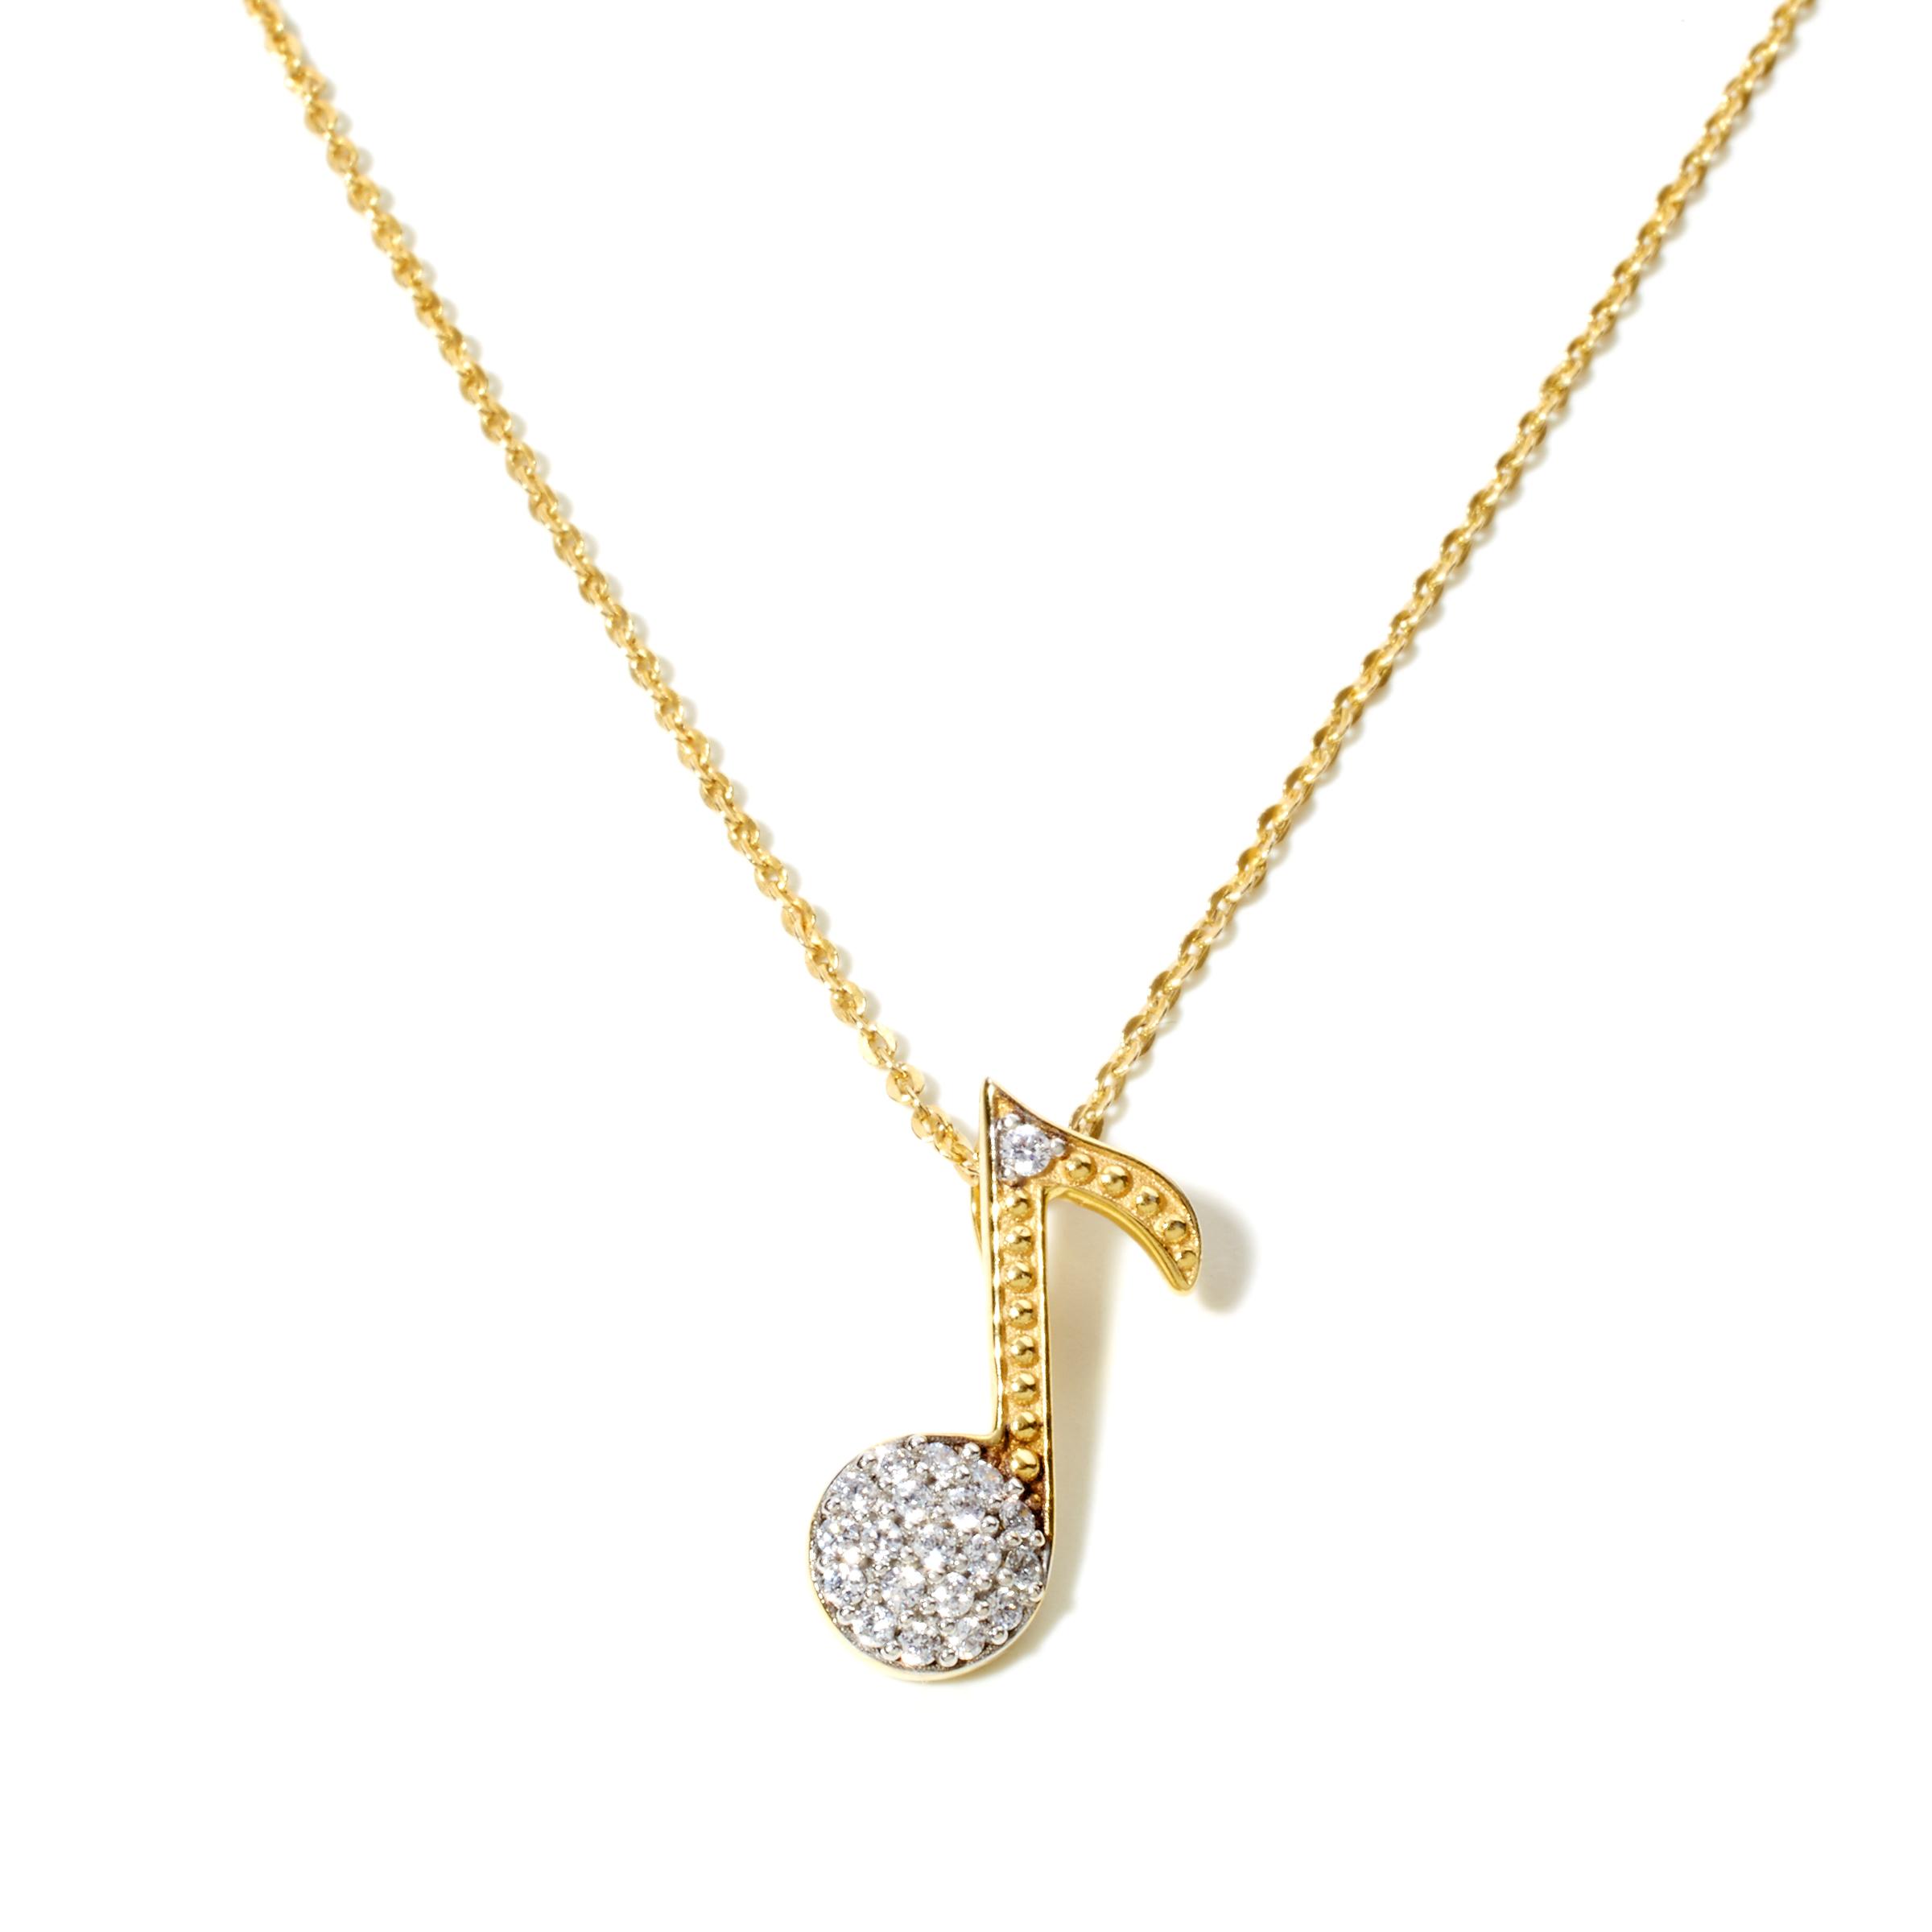 PR2973_0030_Jewelry_PR_Shots_455737